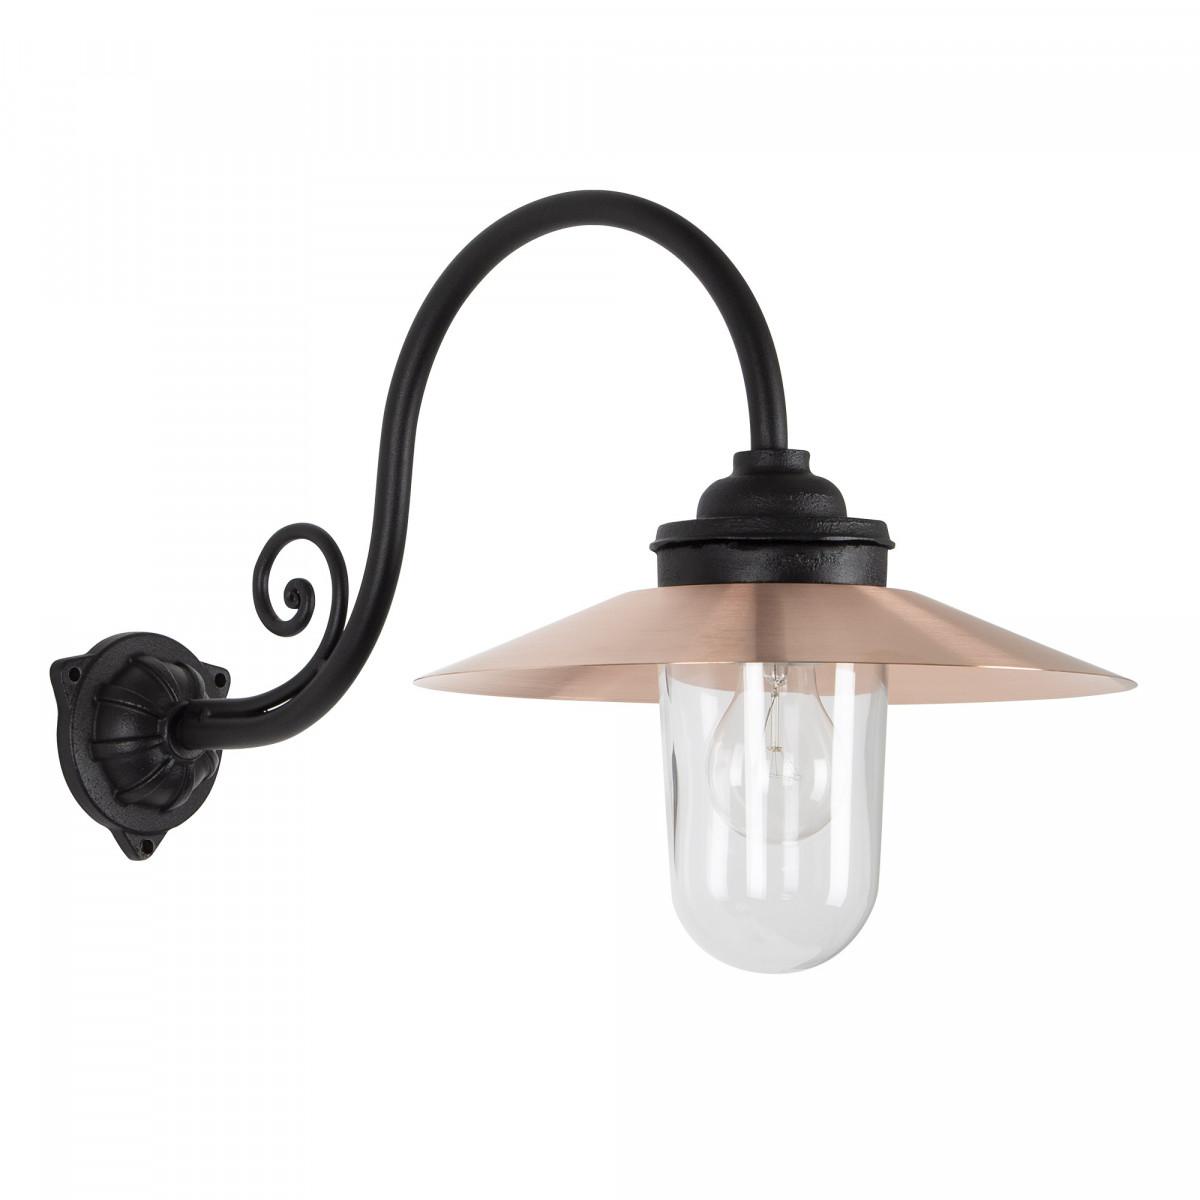 Stoere Stallamp Rhone buitenlamp  Zwart & Koper